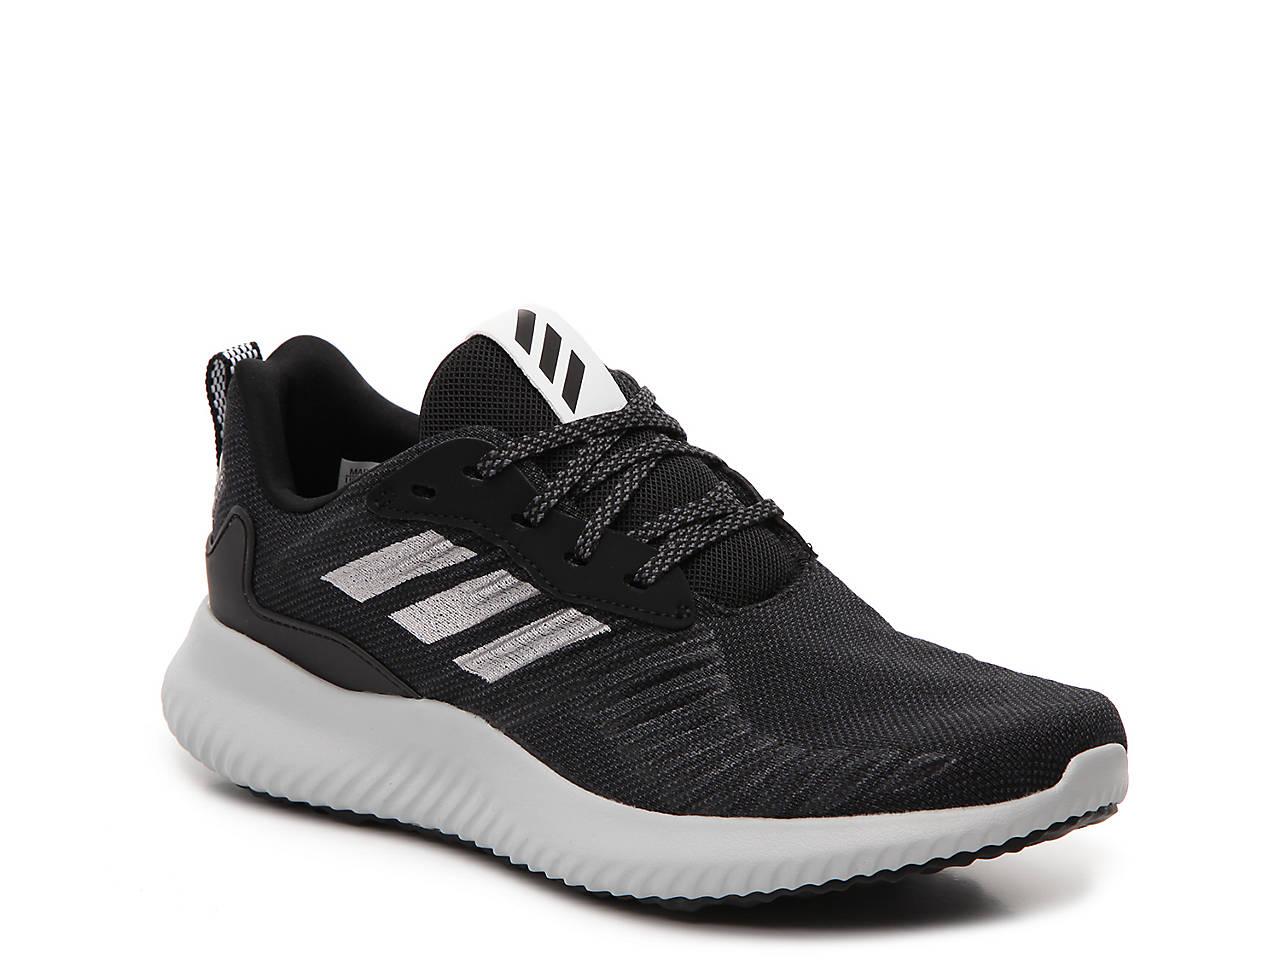 adidas alphabounce rc scarpa da corsa, le scarpe da donna dsw